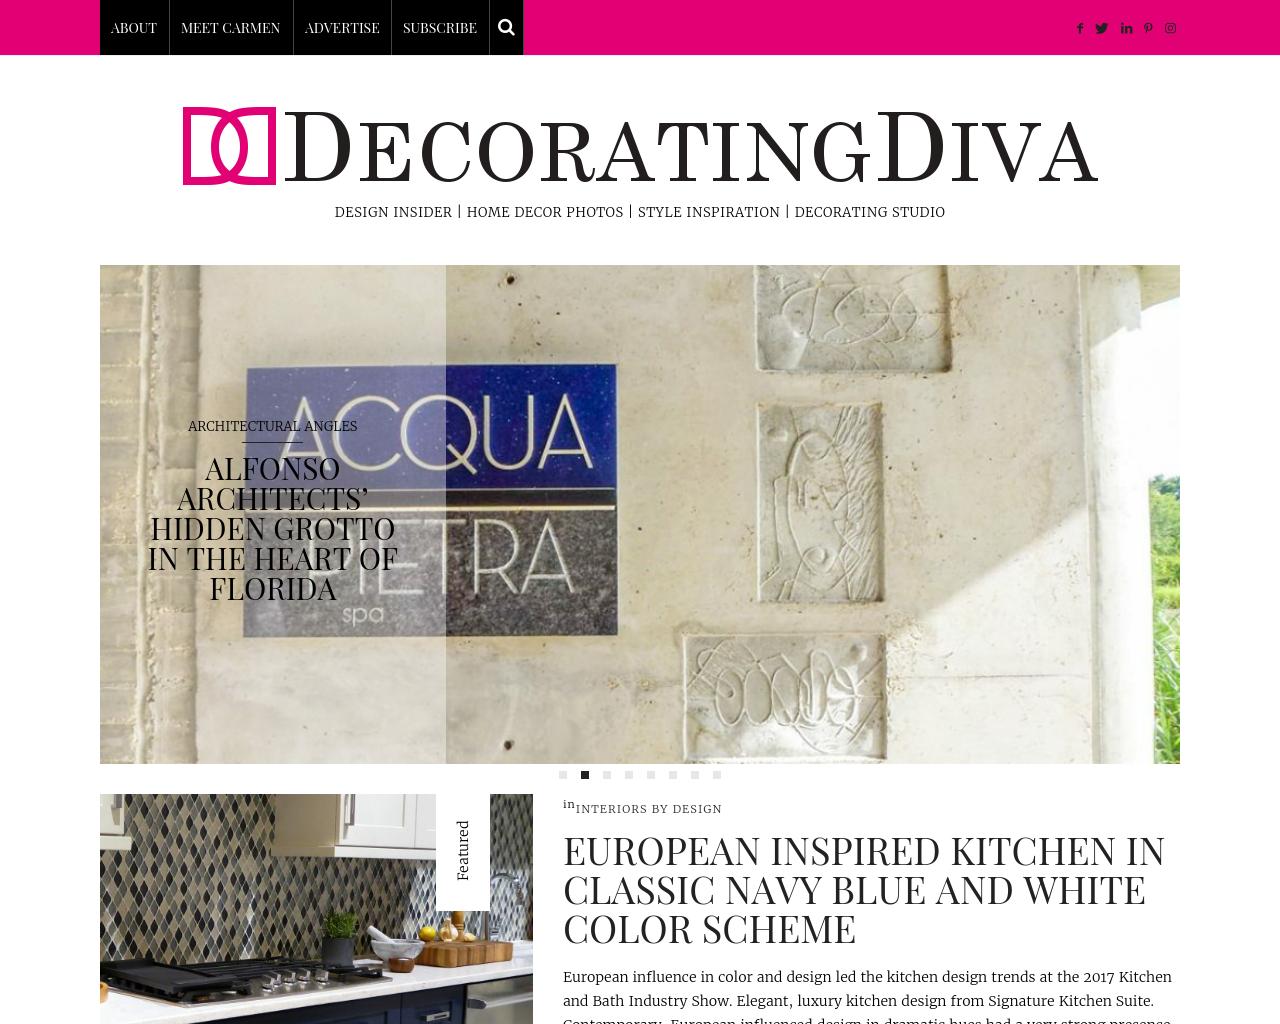 Decorating-Diva-Advertising-Reviews-Pricing